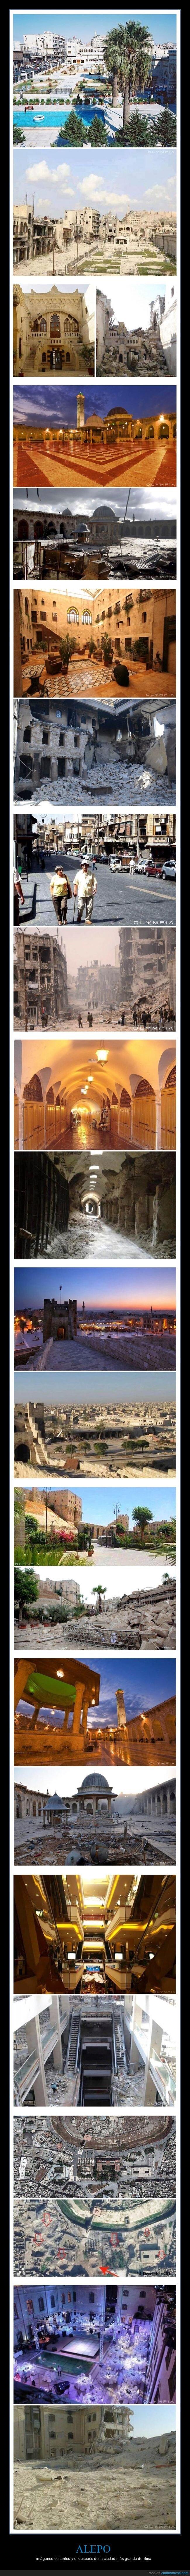 alepo,antes,después,guerra,siria